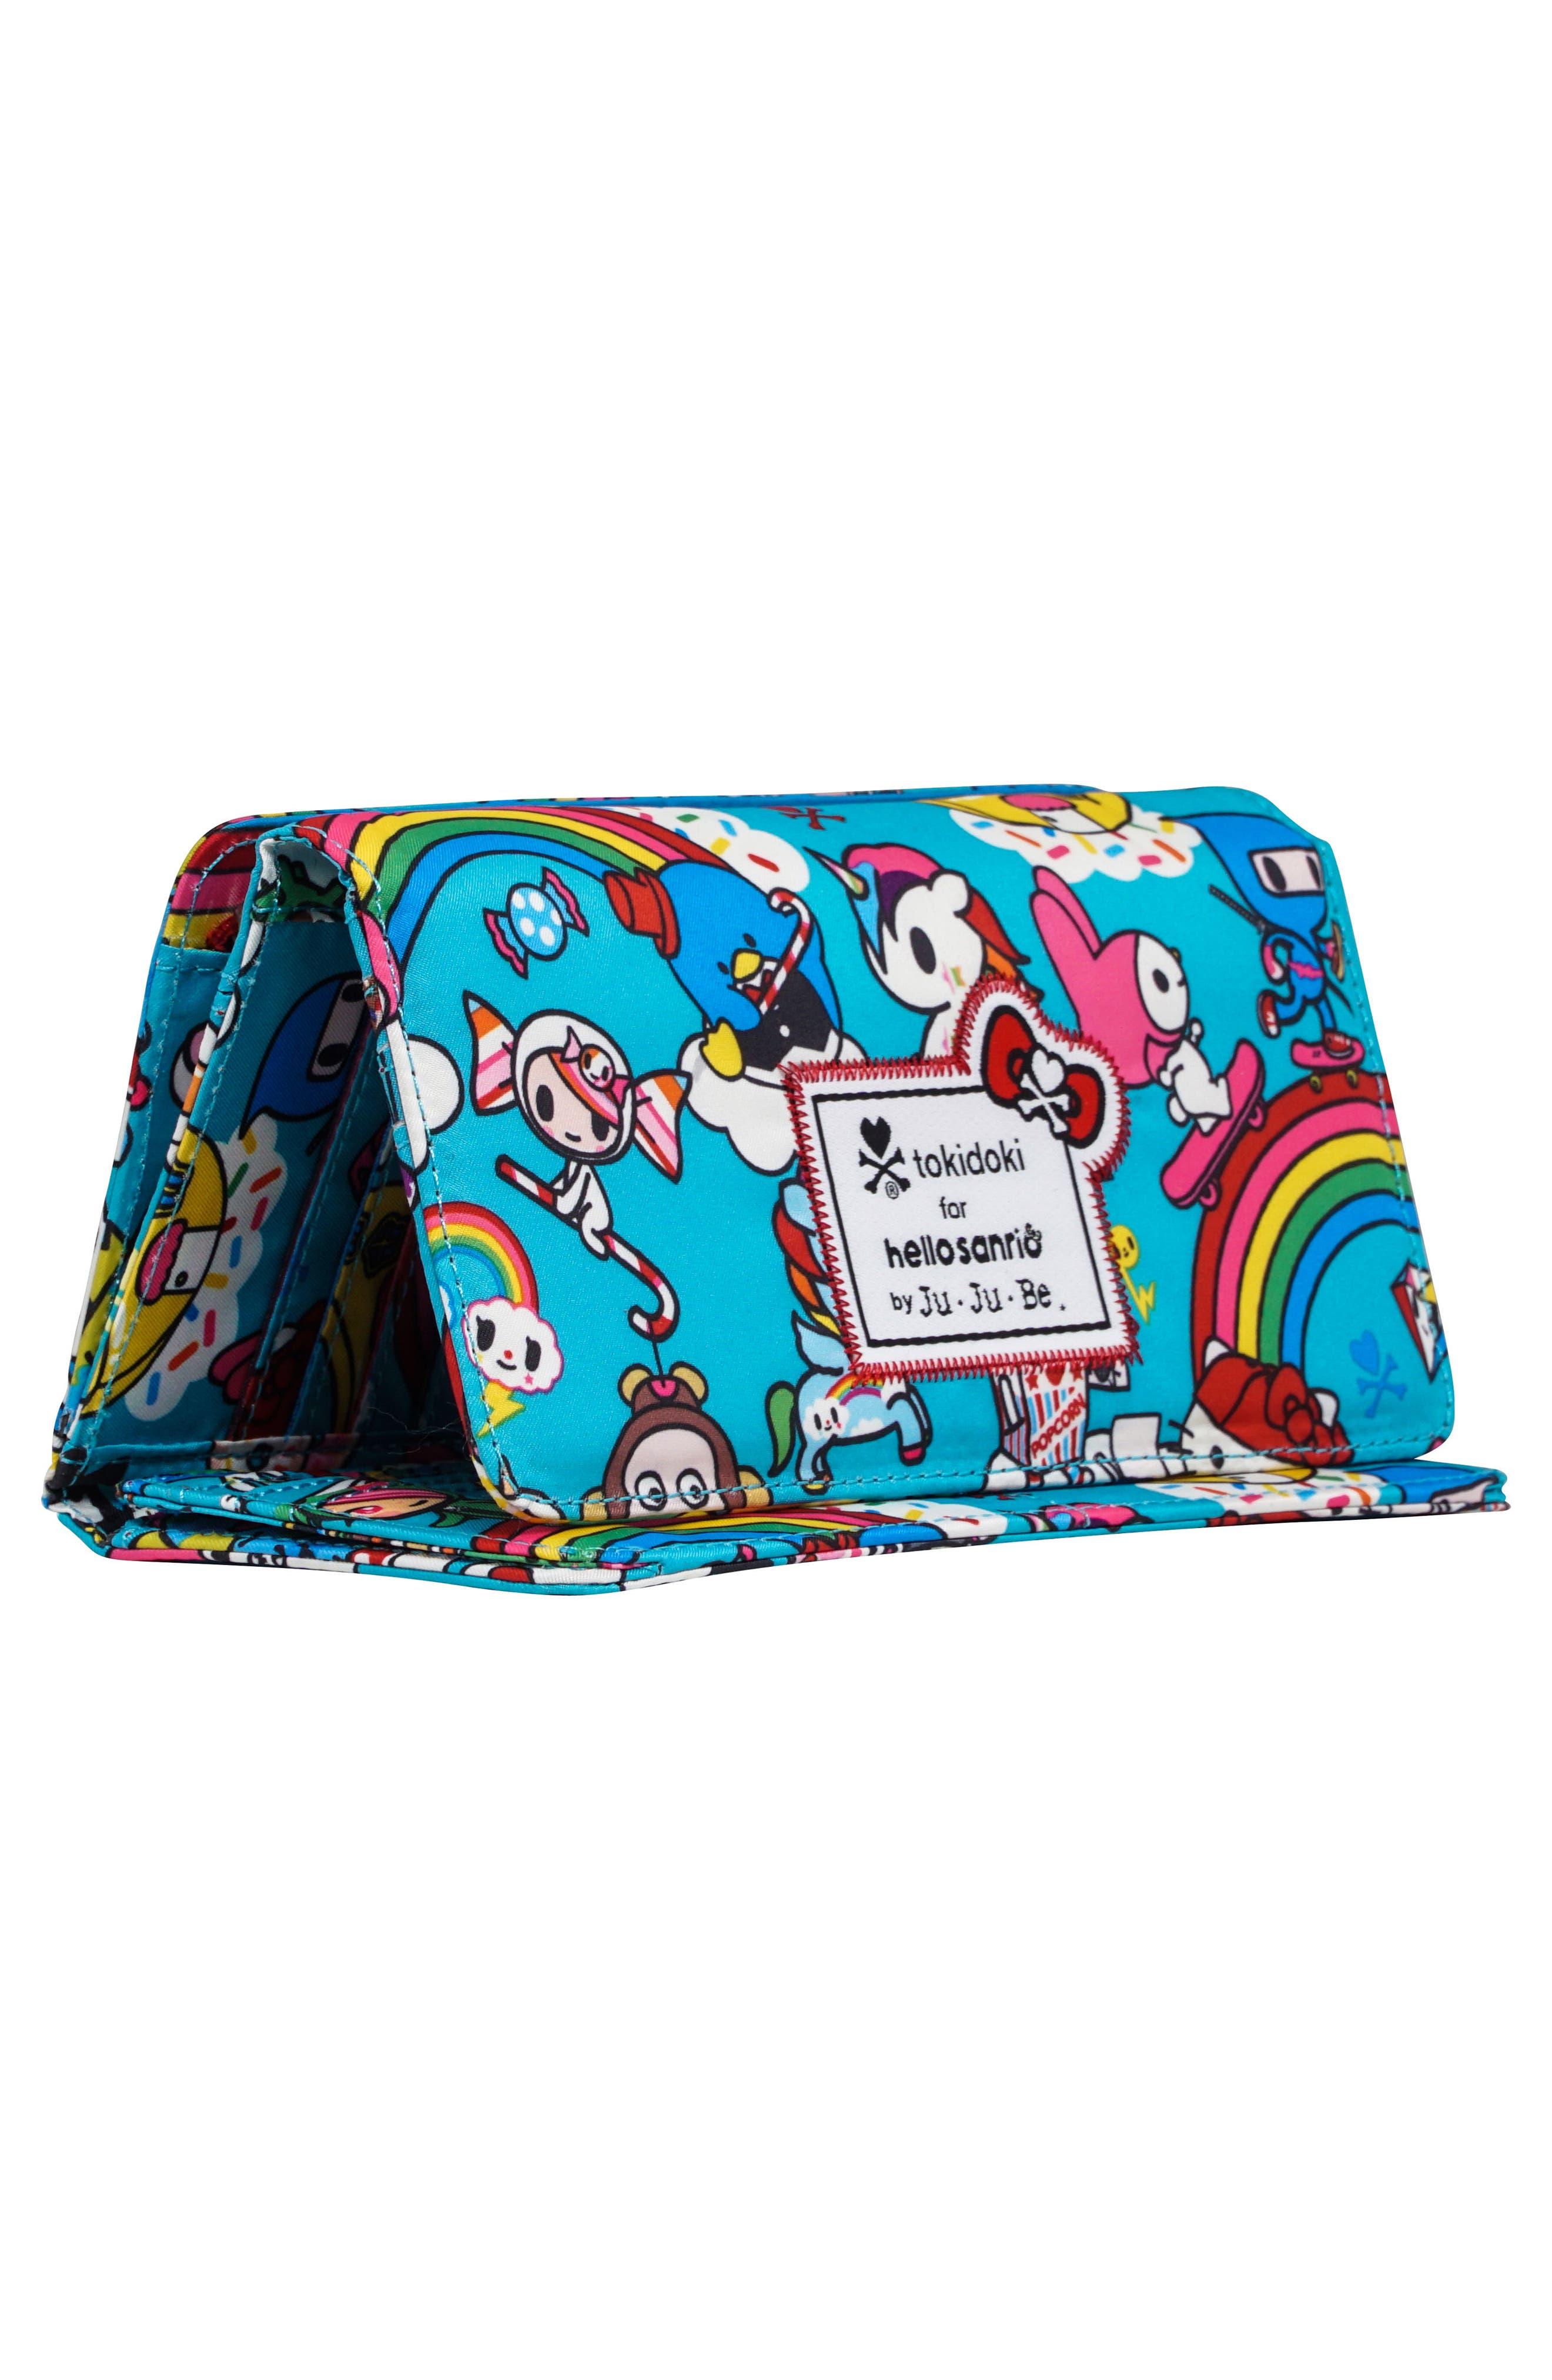 x tokidoki for Hello Sanrio Rainbow Dreams Be Rich Trifold Clutch Wallet,                             Alternate thumbnail 2, color,                             RAINBOW DREAMS